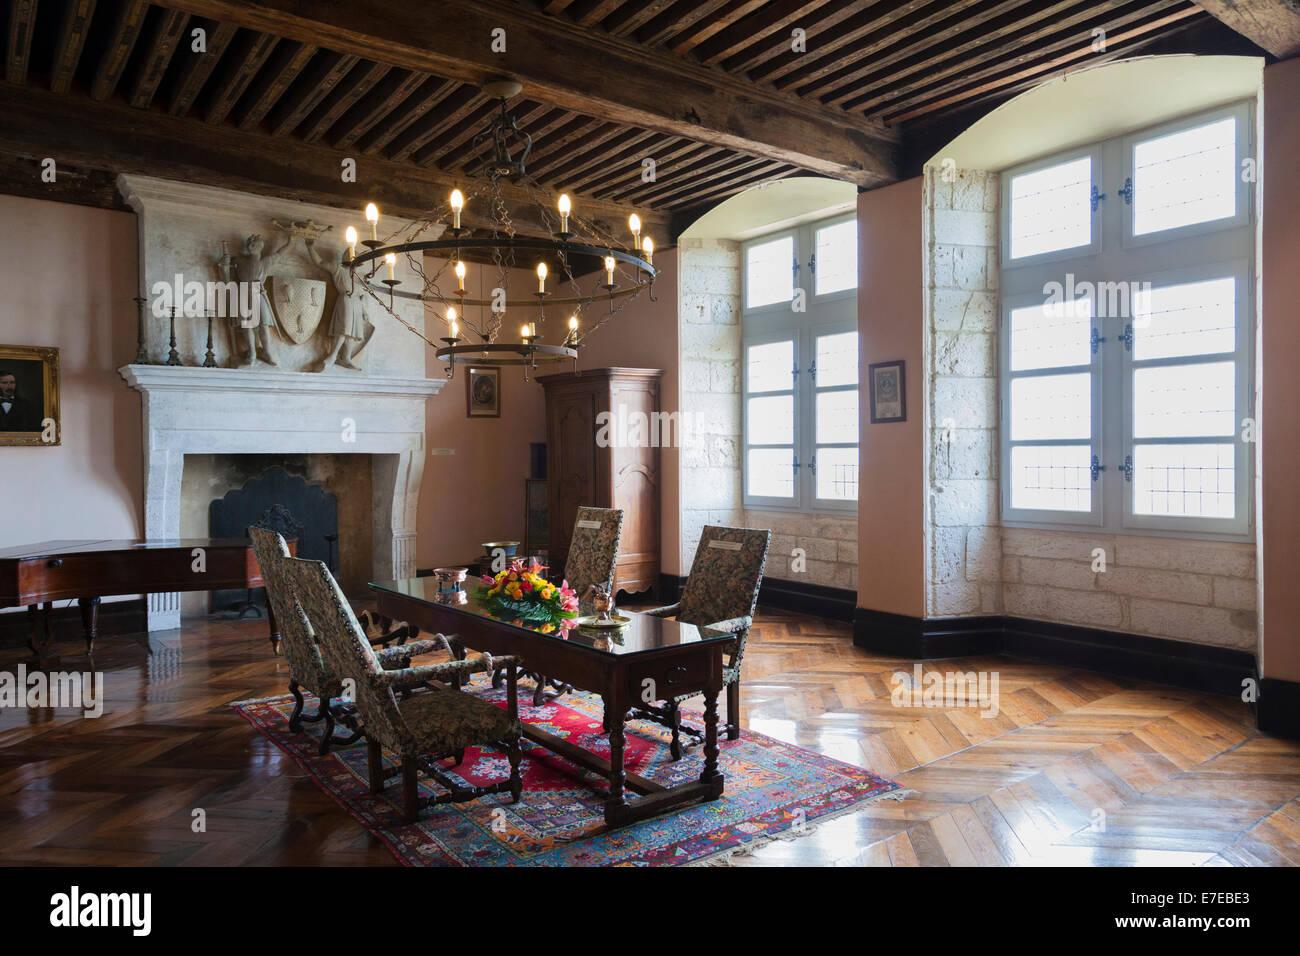 The grand Salon inside the Chateau de Monbazillac France Stock Photo 73460411  Alamy